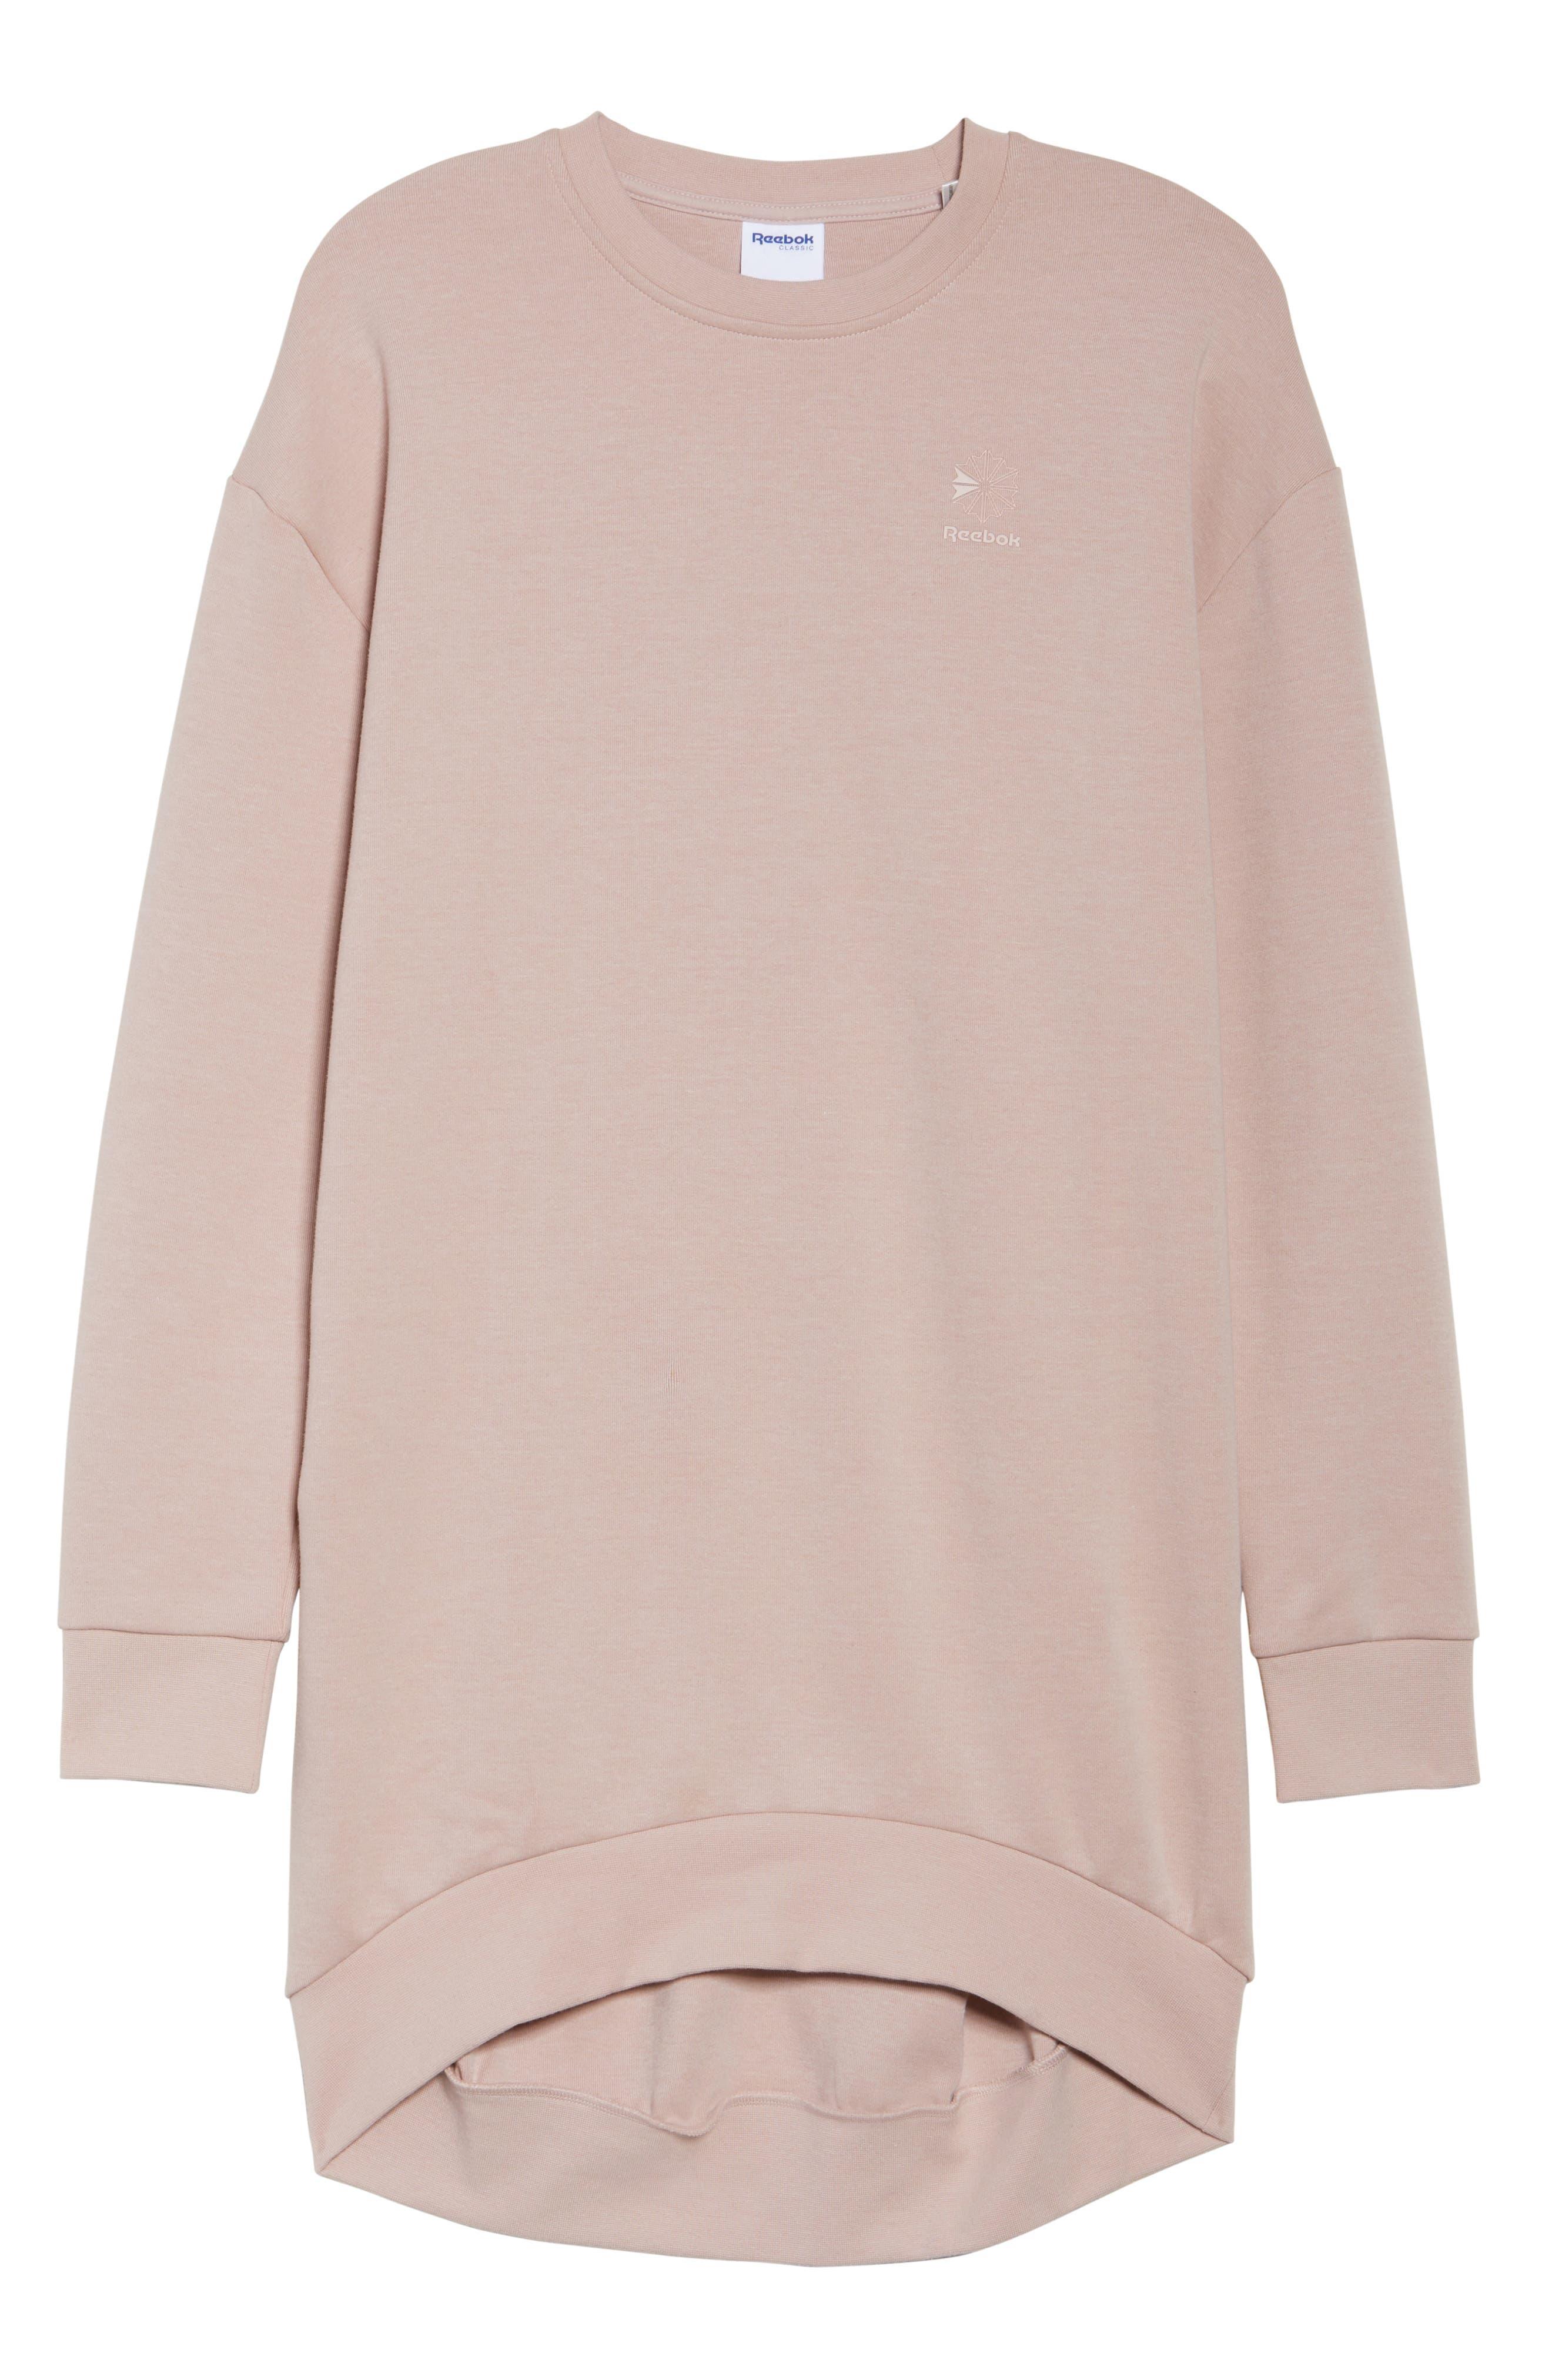 Oversized Sweatshirt,                             Main thumbnail 1, color,                             Shell Pink